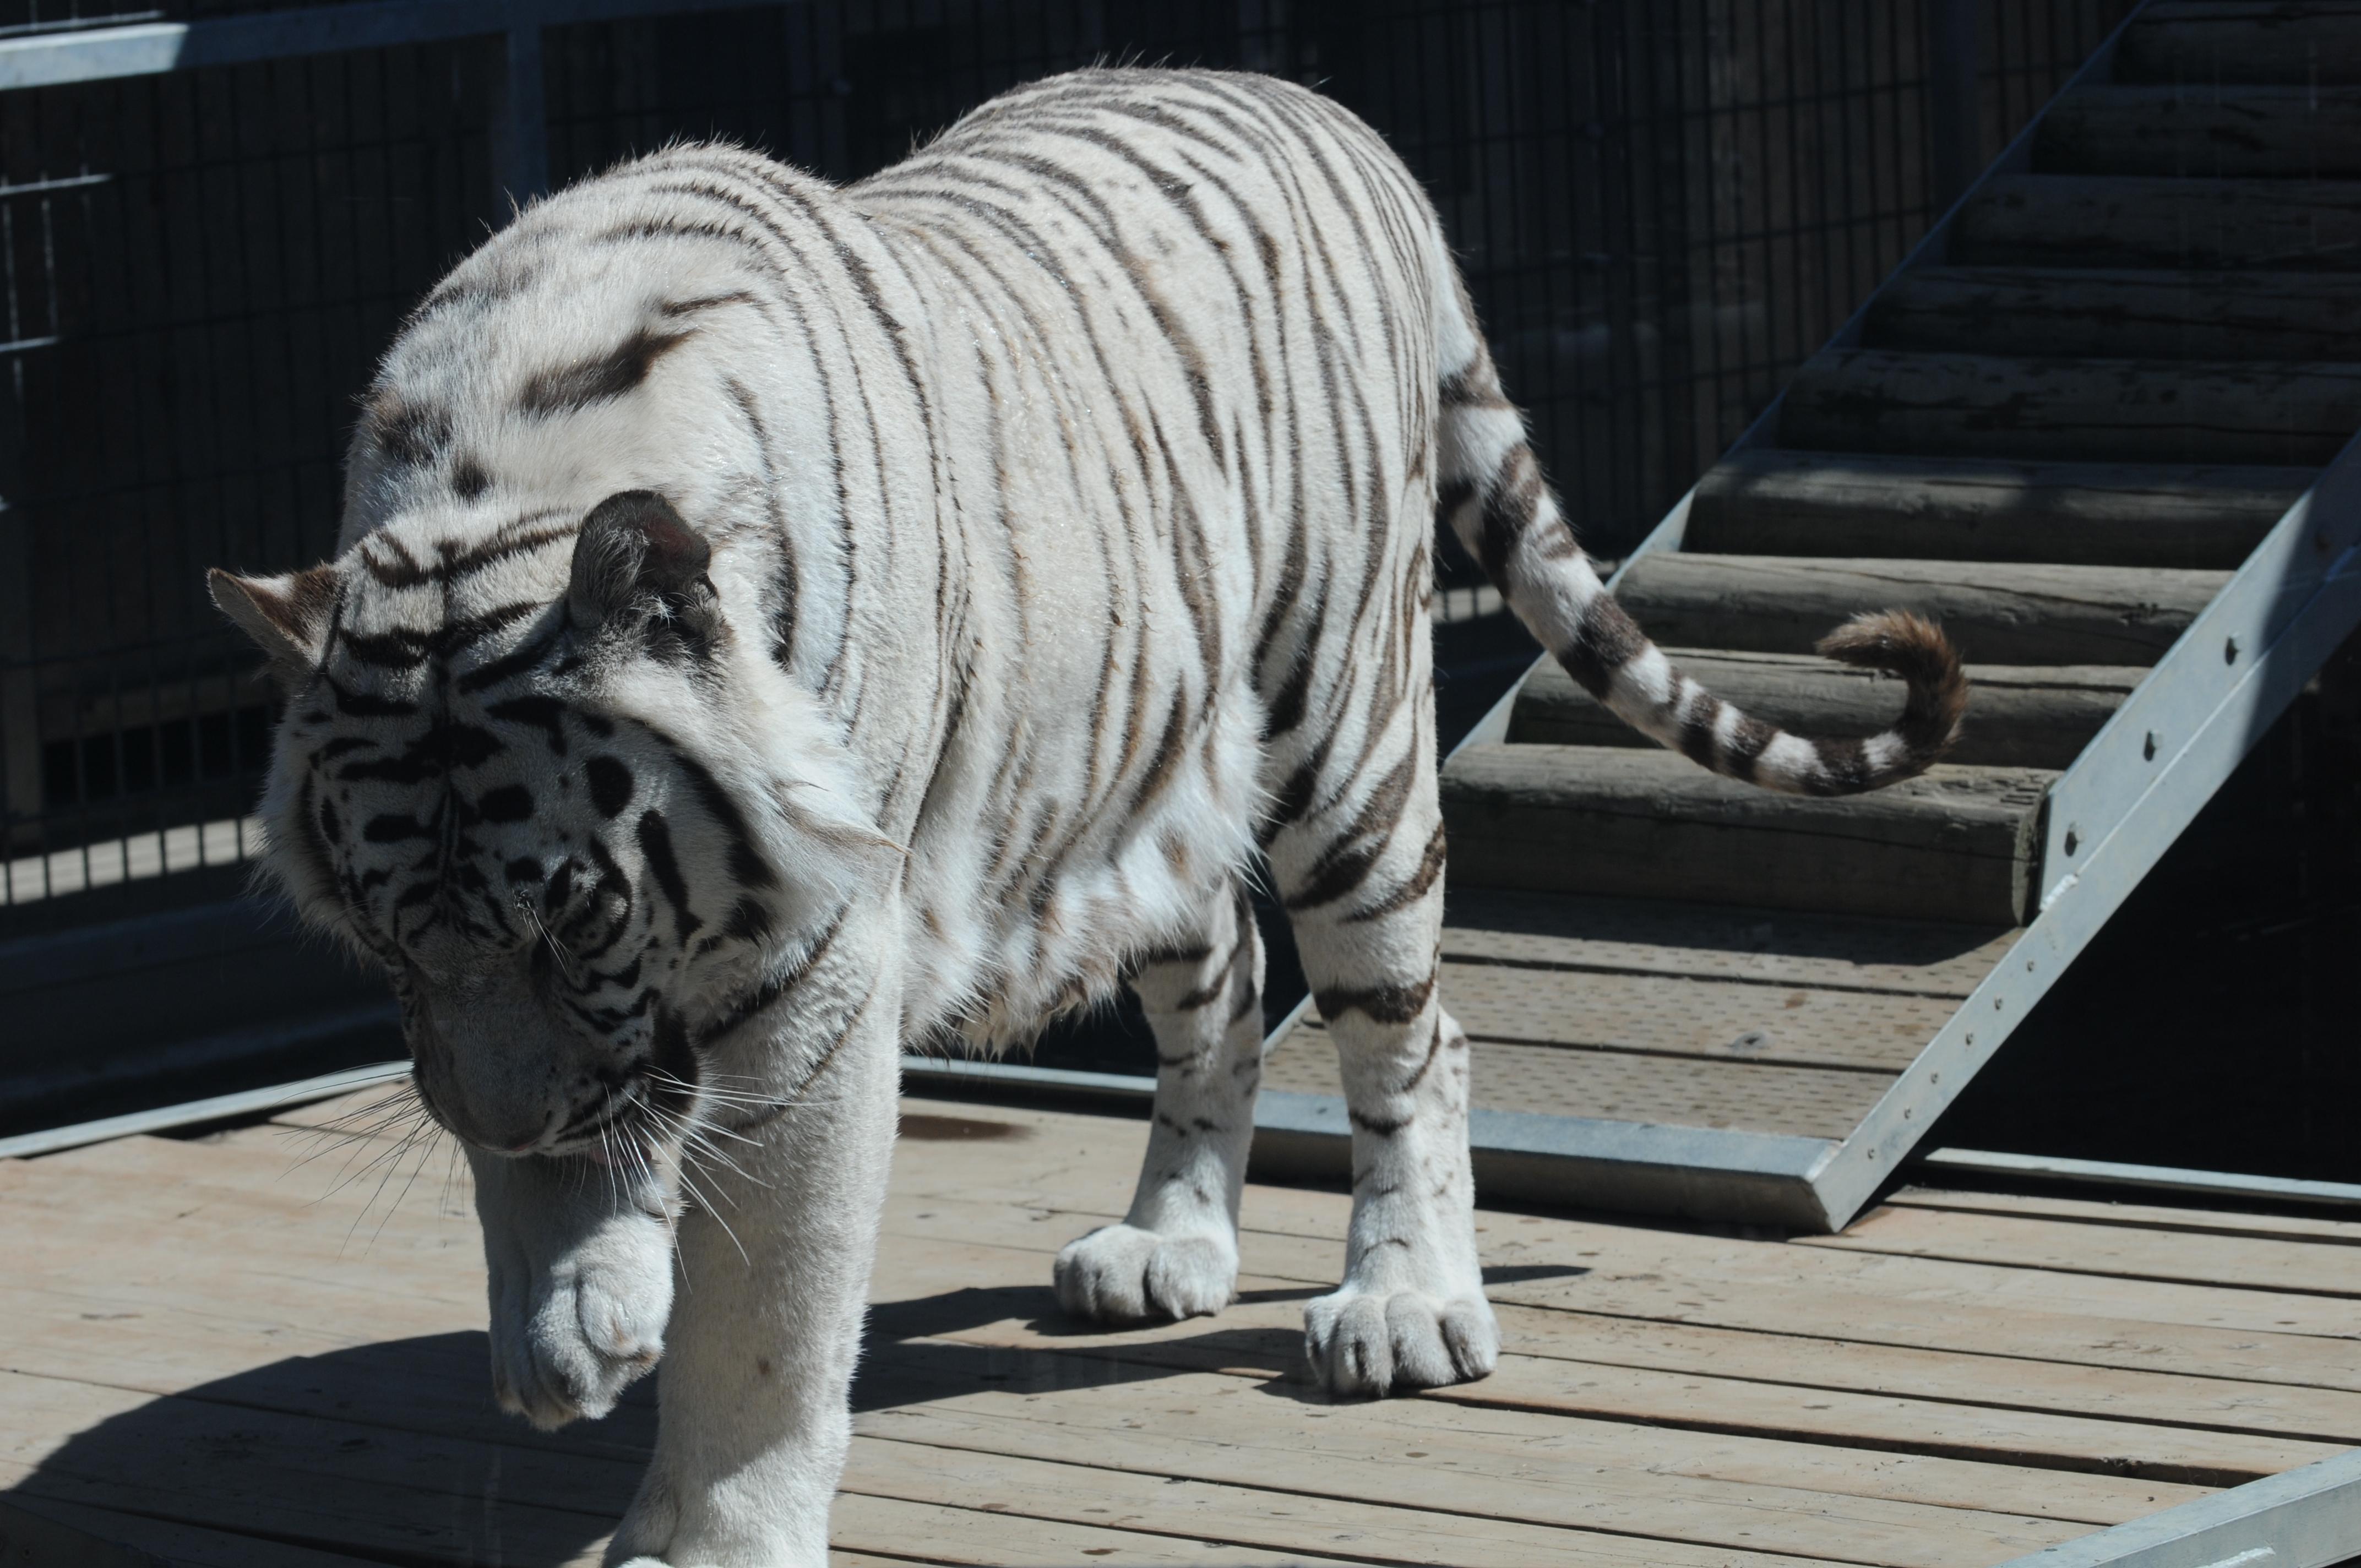 ramp at Cougar Mountain Zoological Park.jpg English: A Royal White Bengal Tiger walking, having just descended a ramp in its habitat, at Cougar Mountain